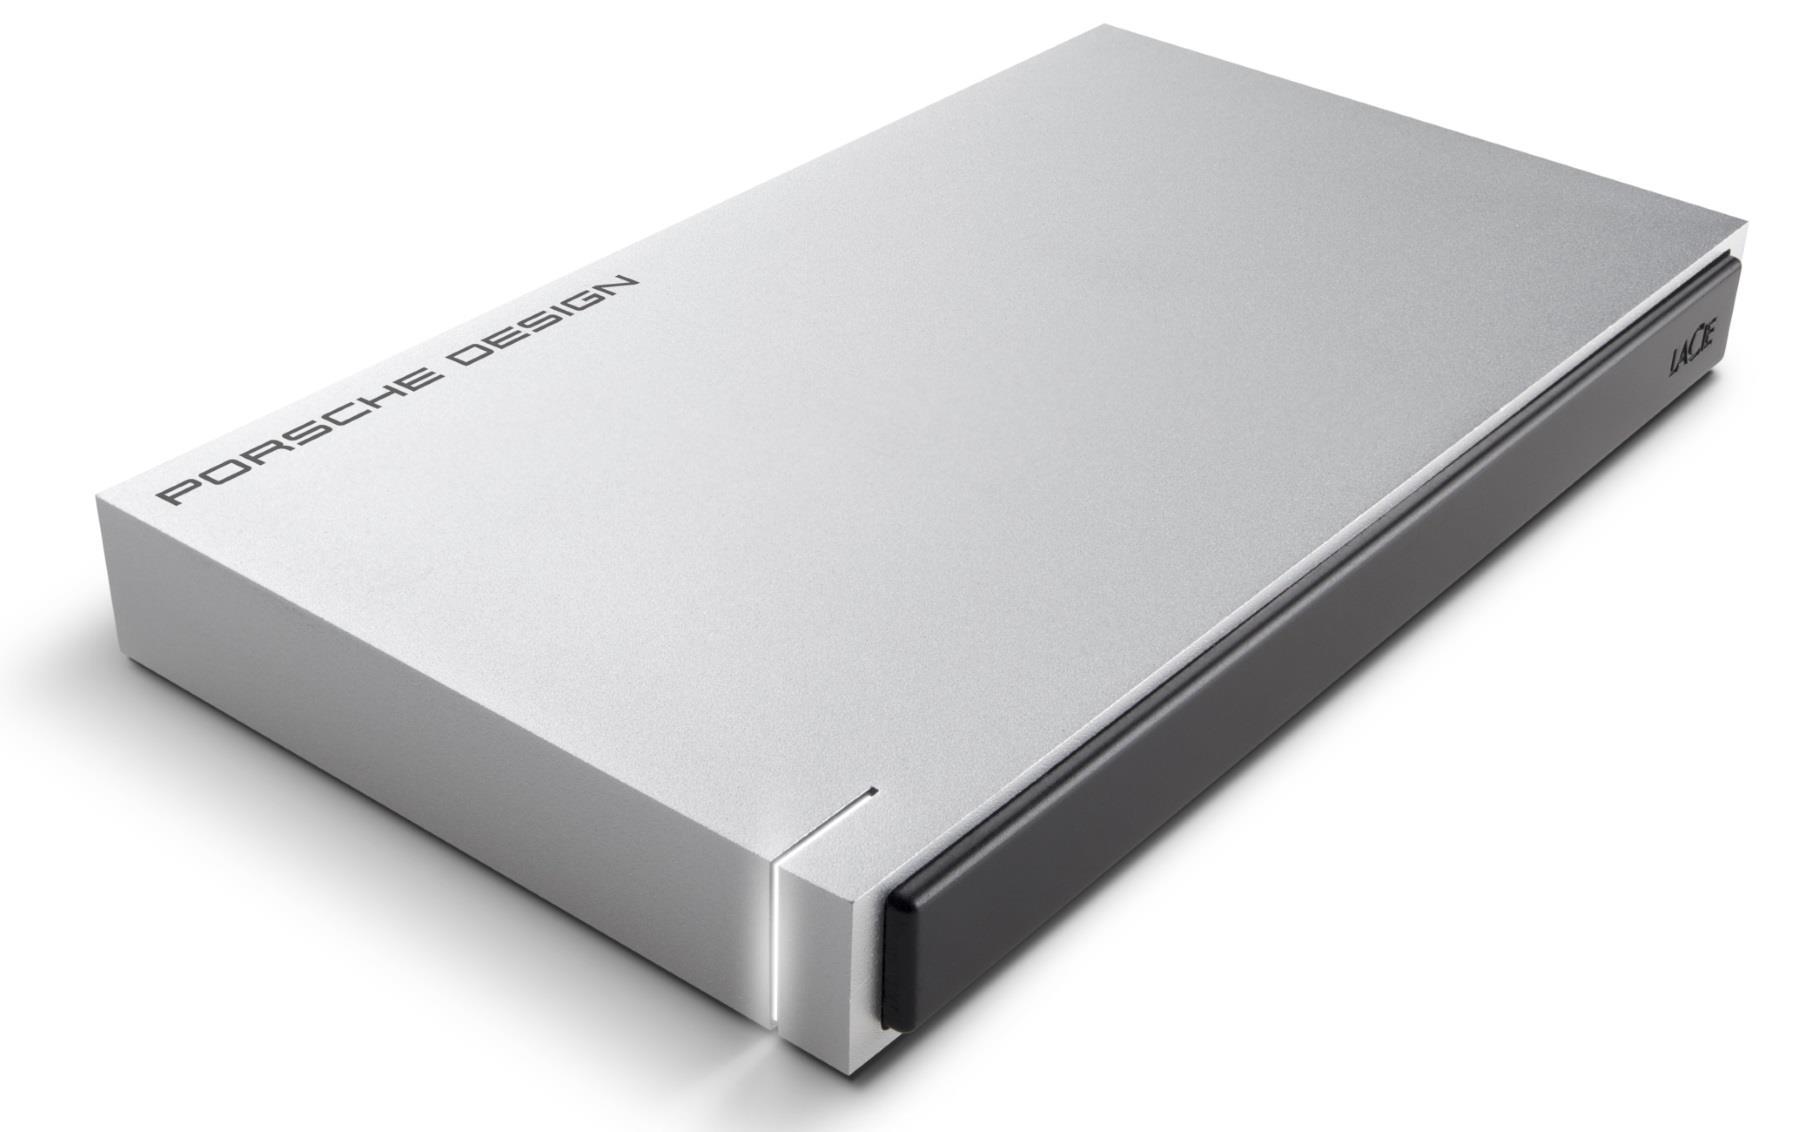 LaCie  STET1000400_BULK (1 TB; 2.5 Inch; USB 3.0; No data; silver color) Ārējais cietais disks